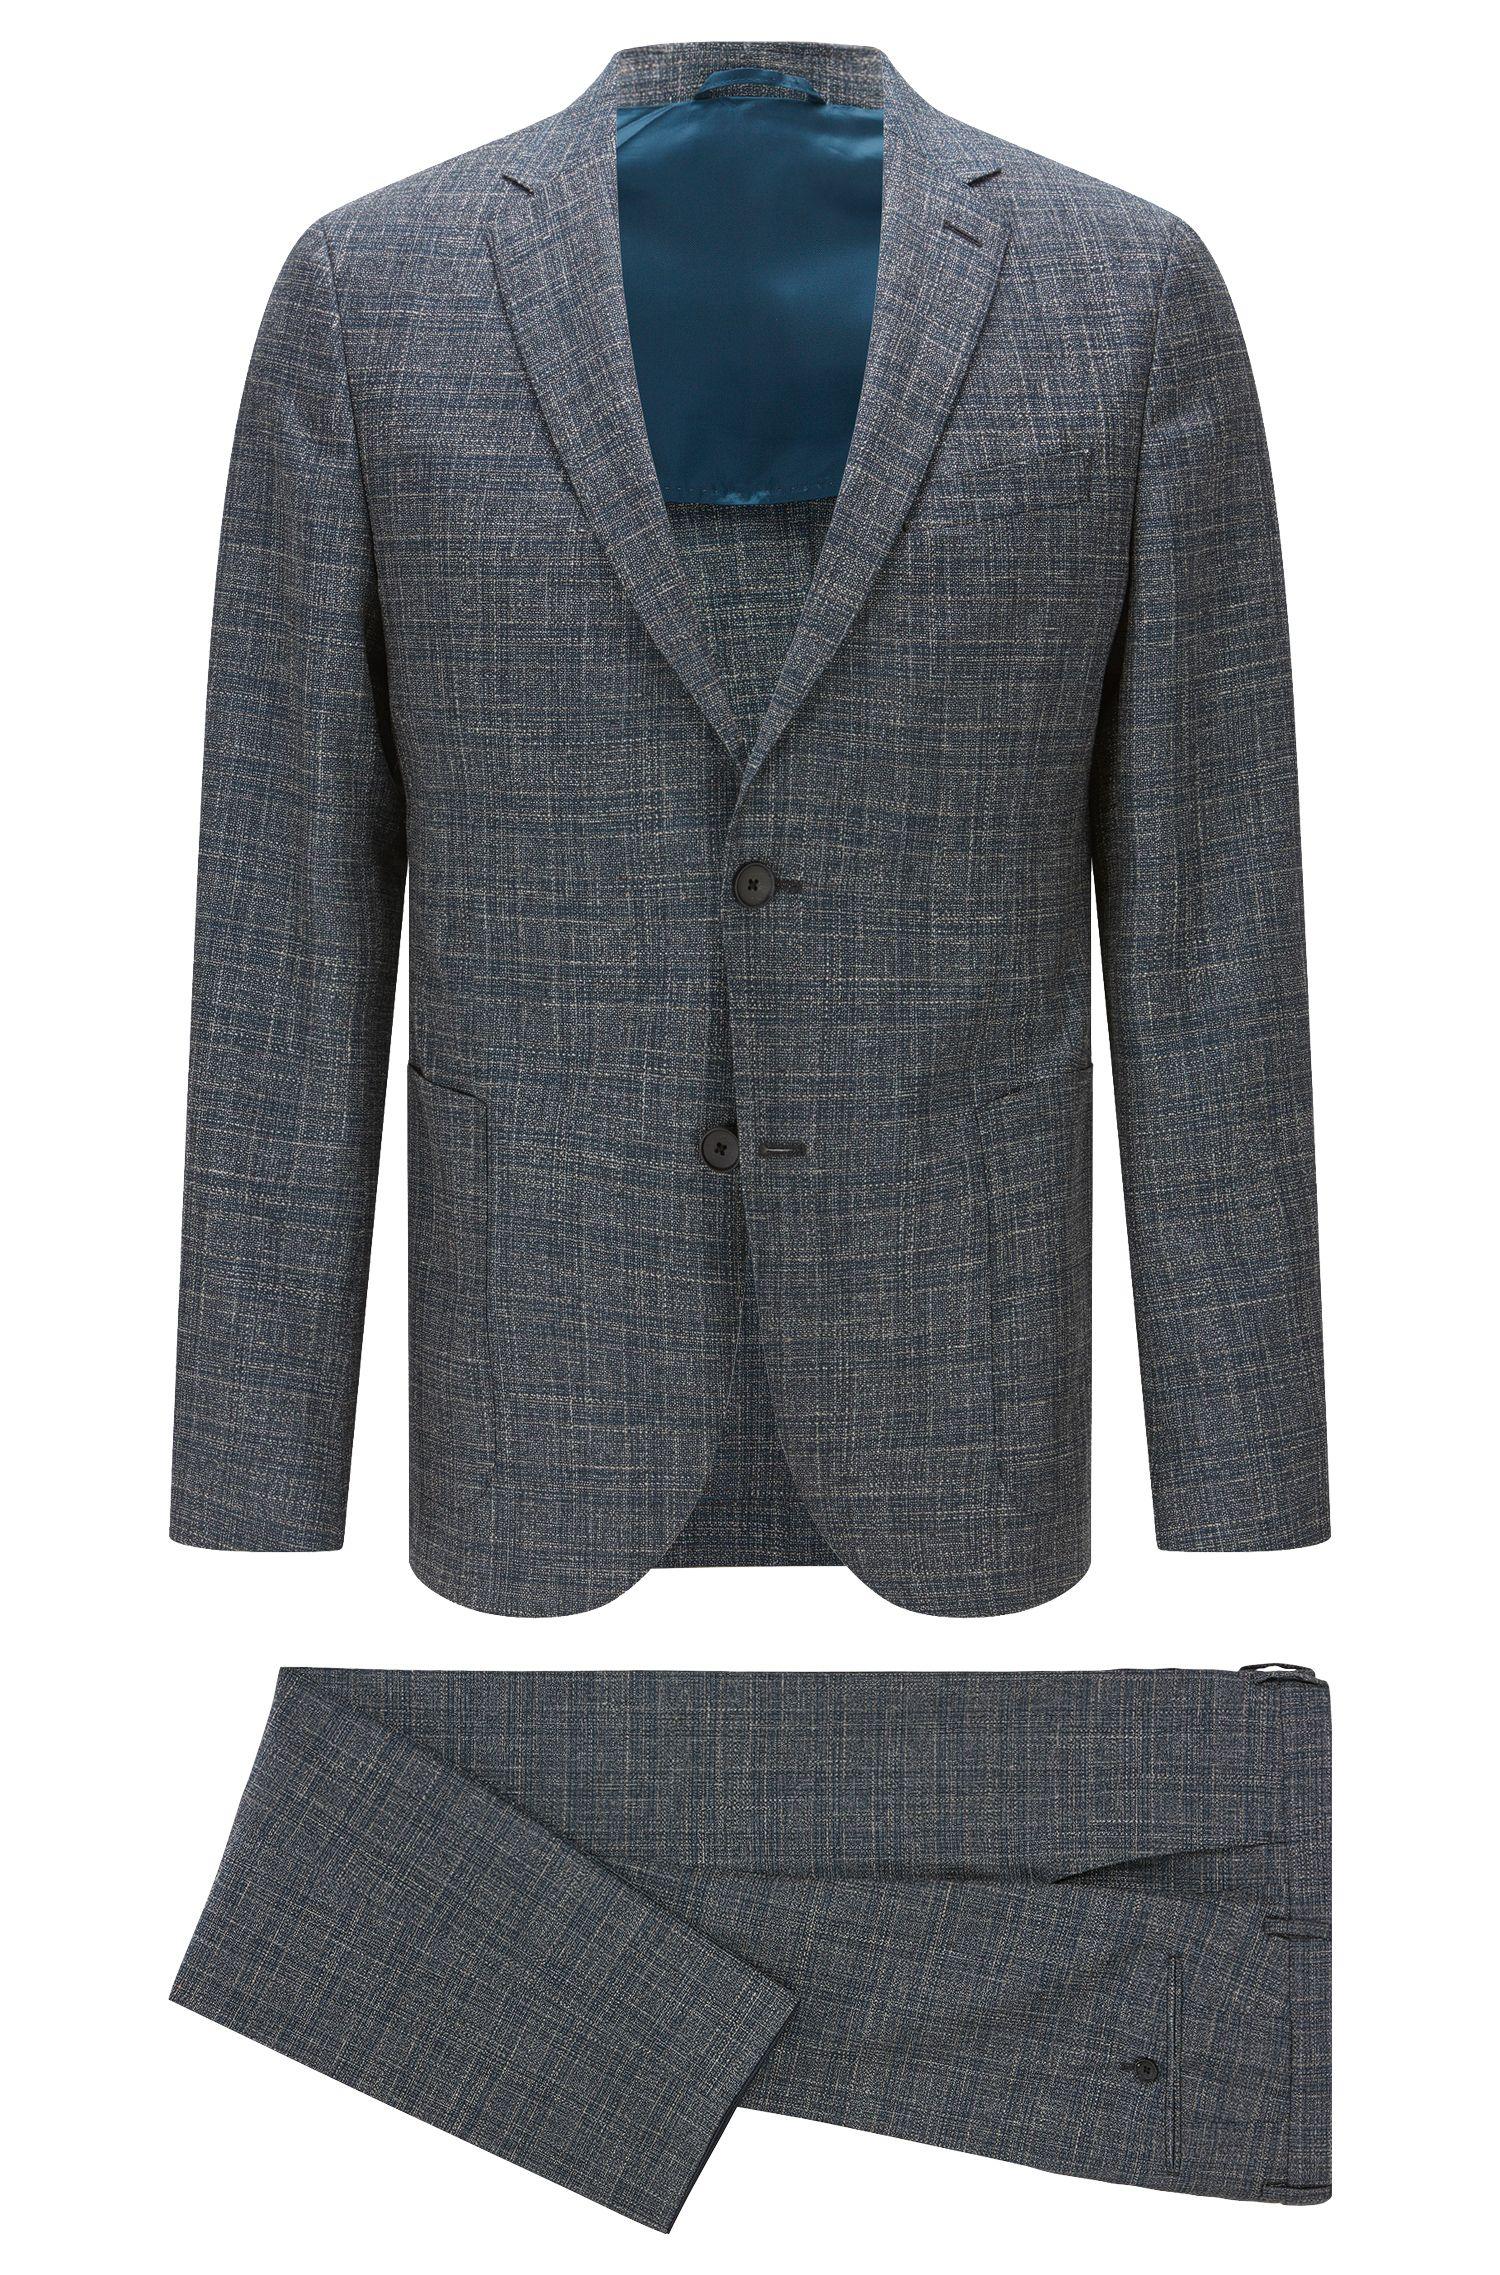 'Nalton/Bennno' | Slim Fit, Virgin Wool Blend Suit